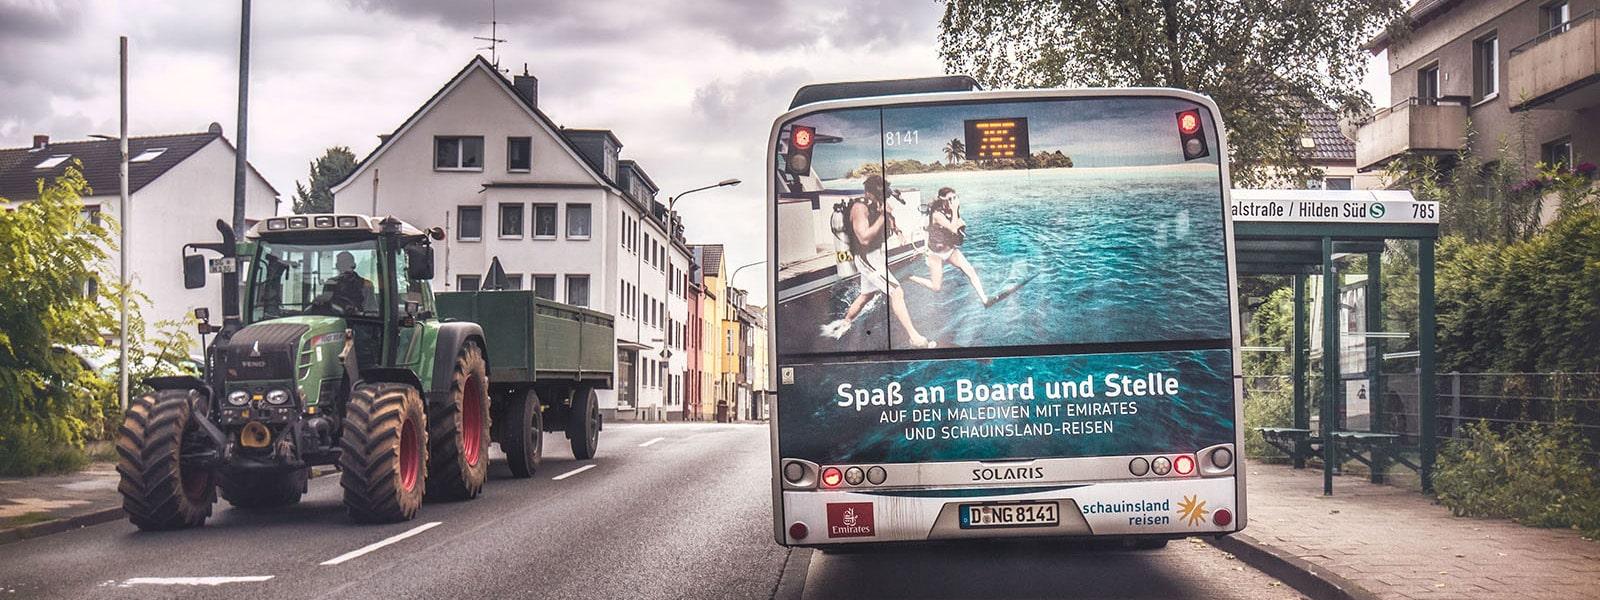 Remscheid-Buswerbung-Heckwerbung